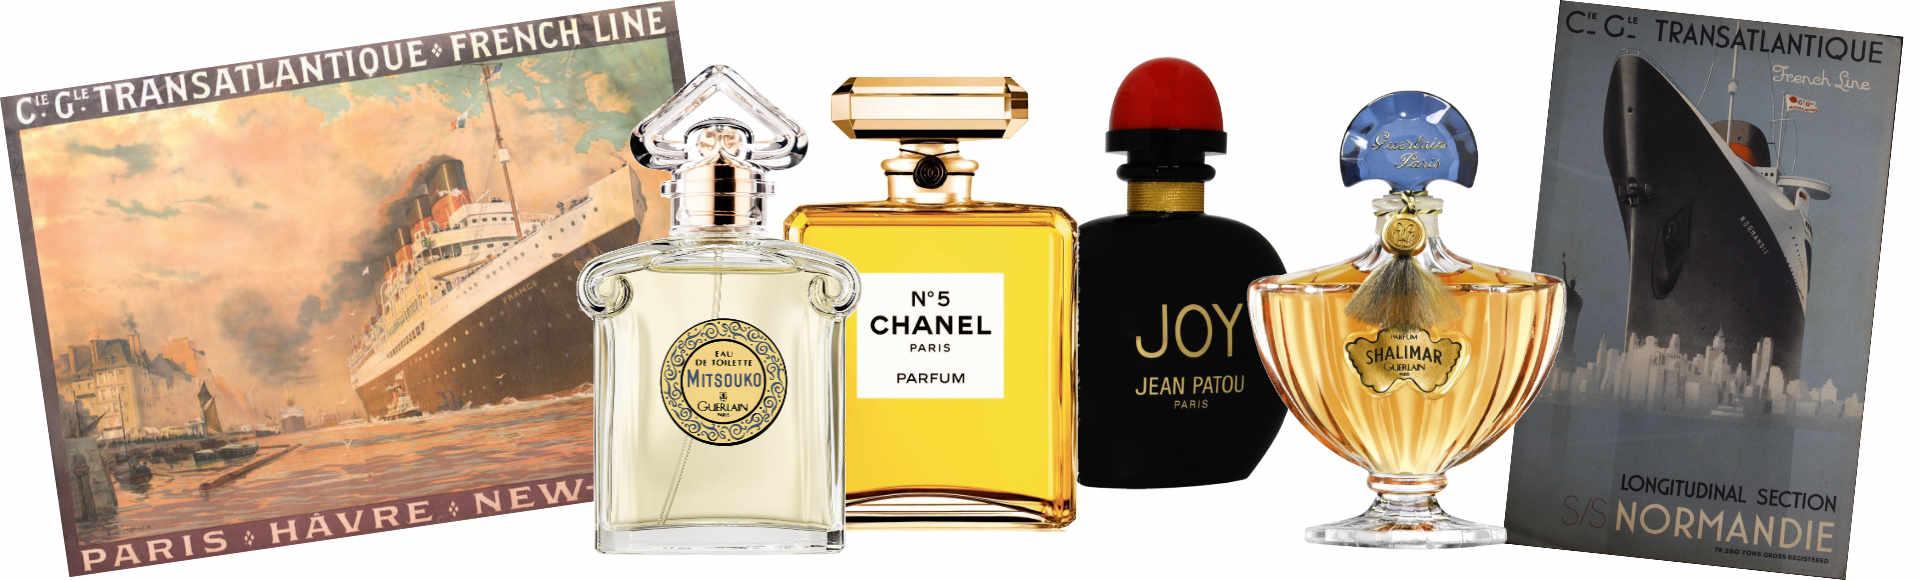 Parfums de traversée & Portraits de paquebots